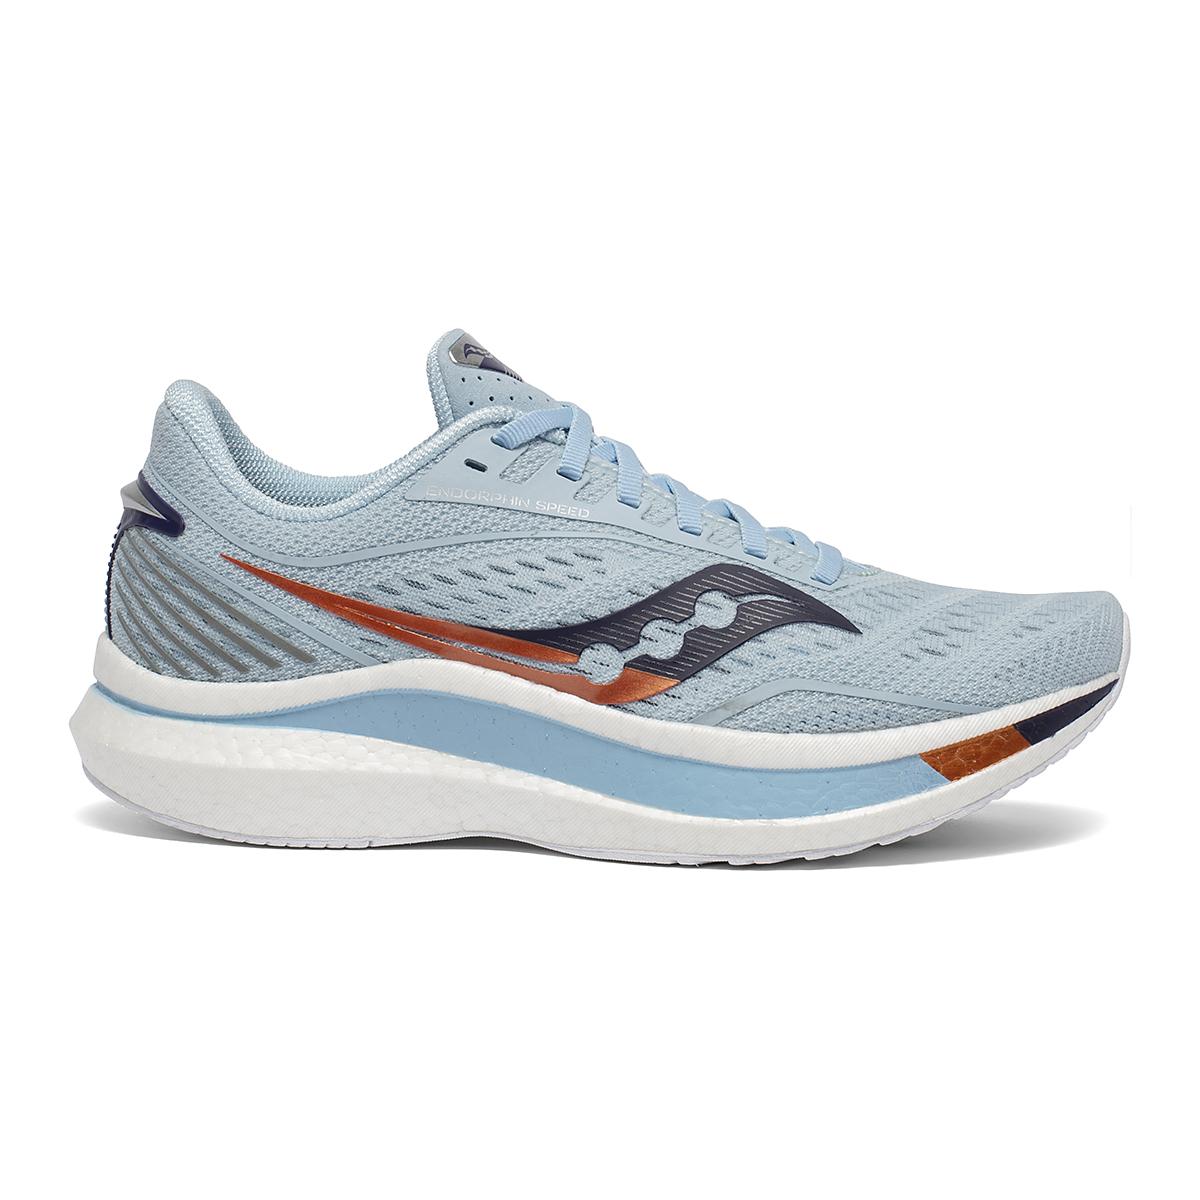 Women's Saucony Endorphin Speed Running Shoe - Color: Sky/Midnight - Size: 8.5 - Width: Regular, Sky/Midnight, large, image 1